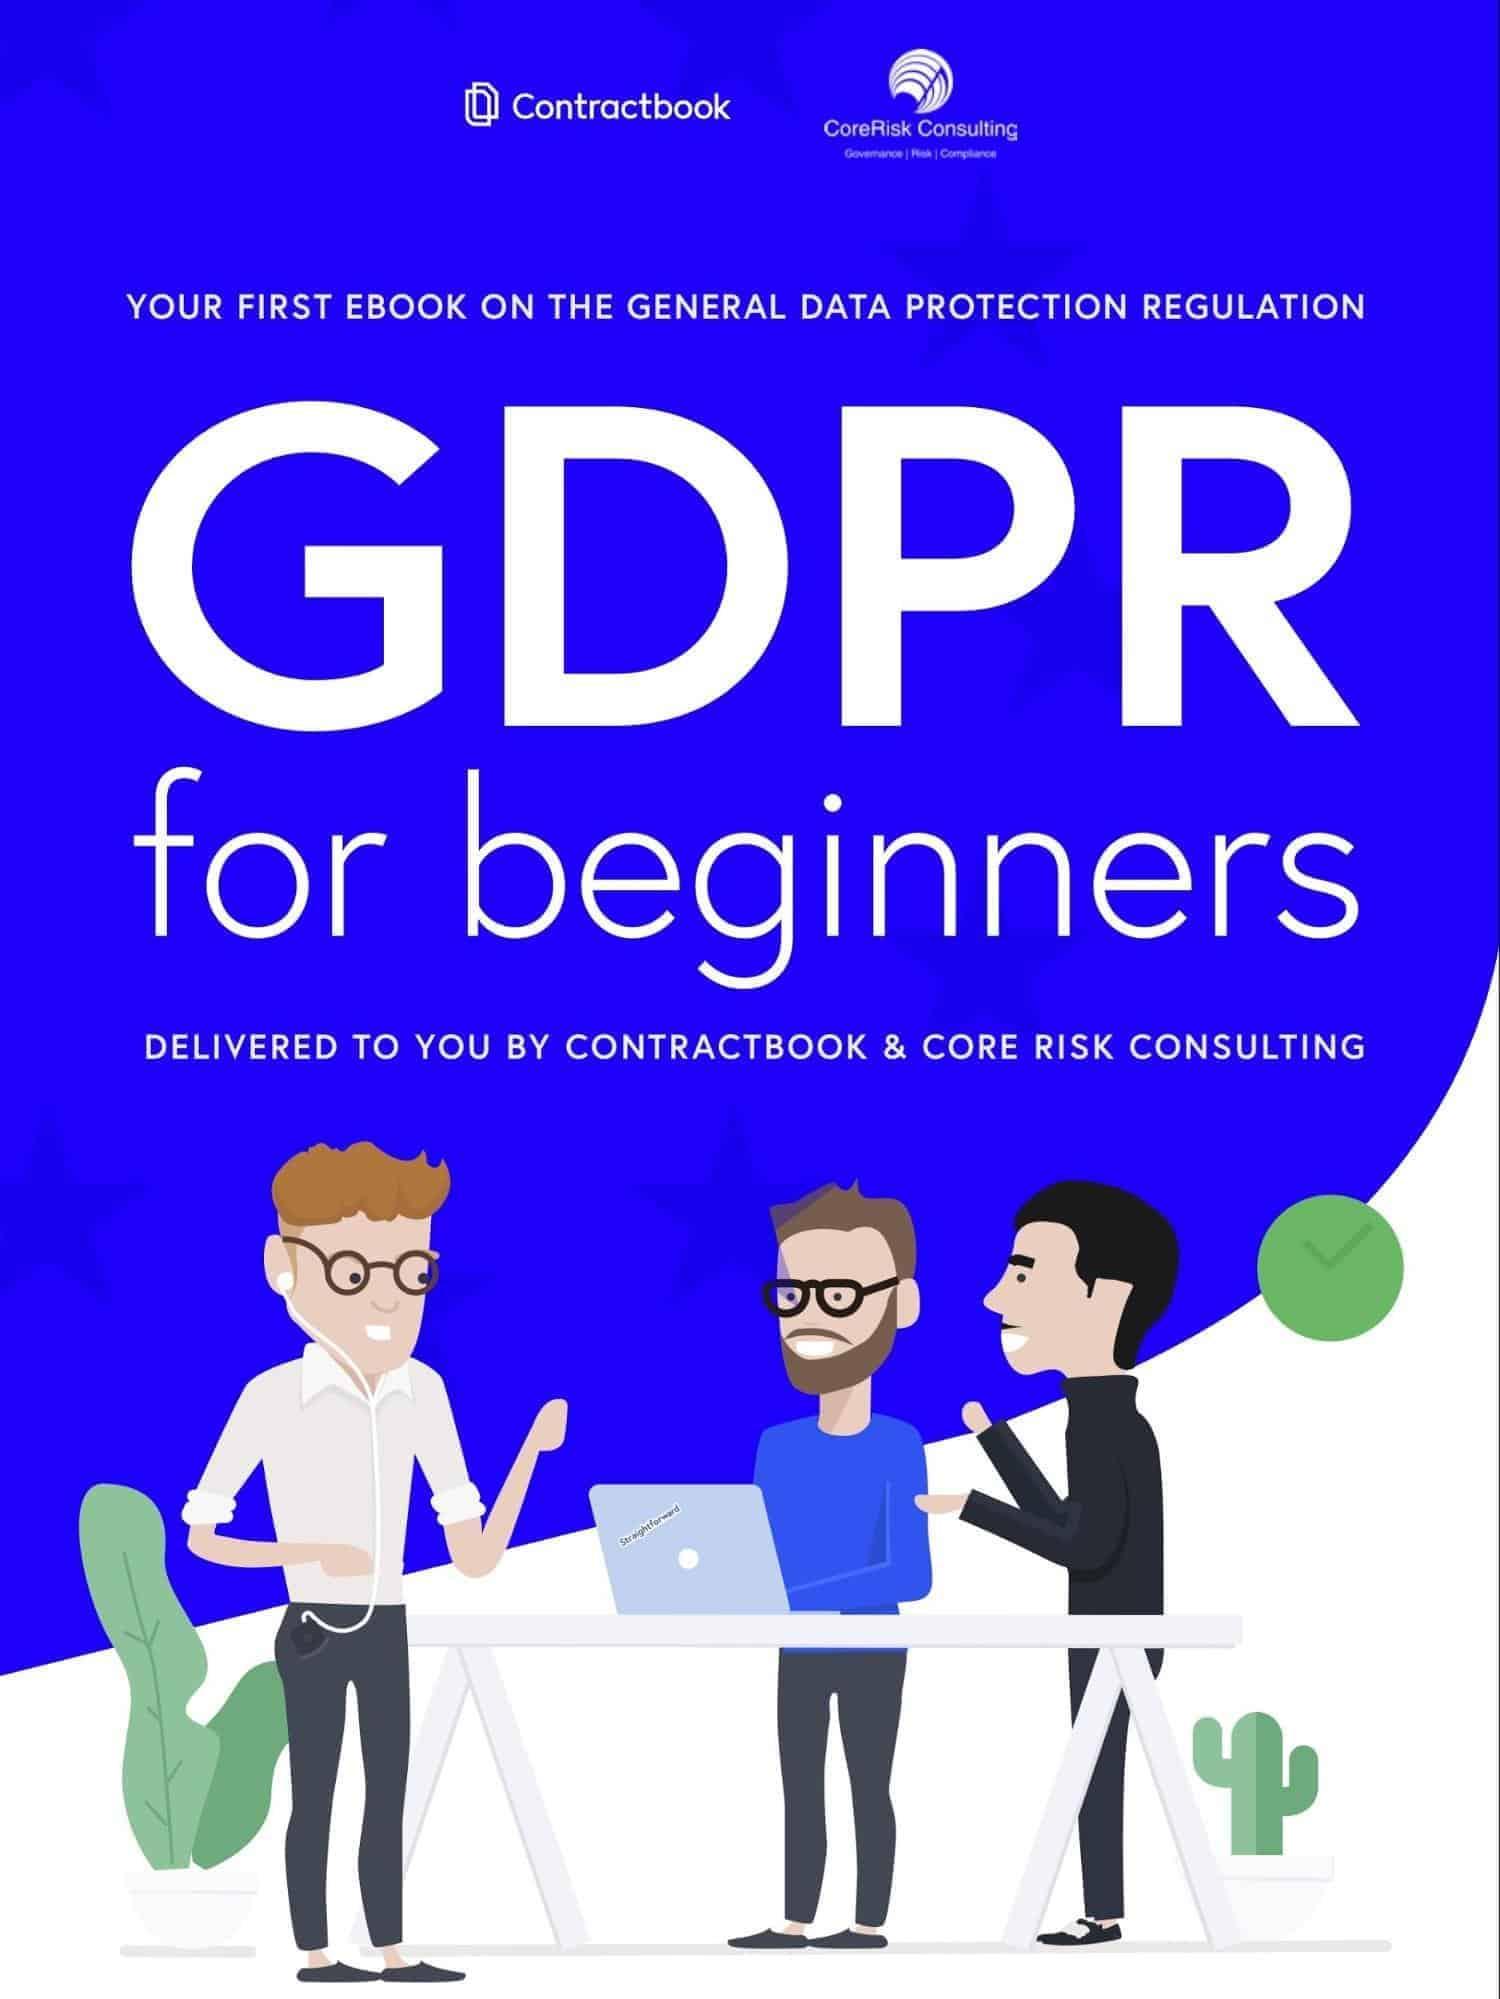 GDPR for beginners free ebook